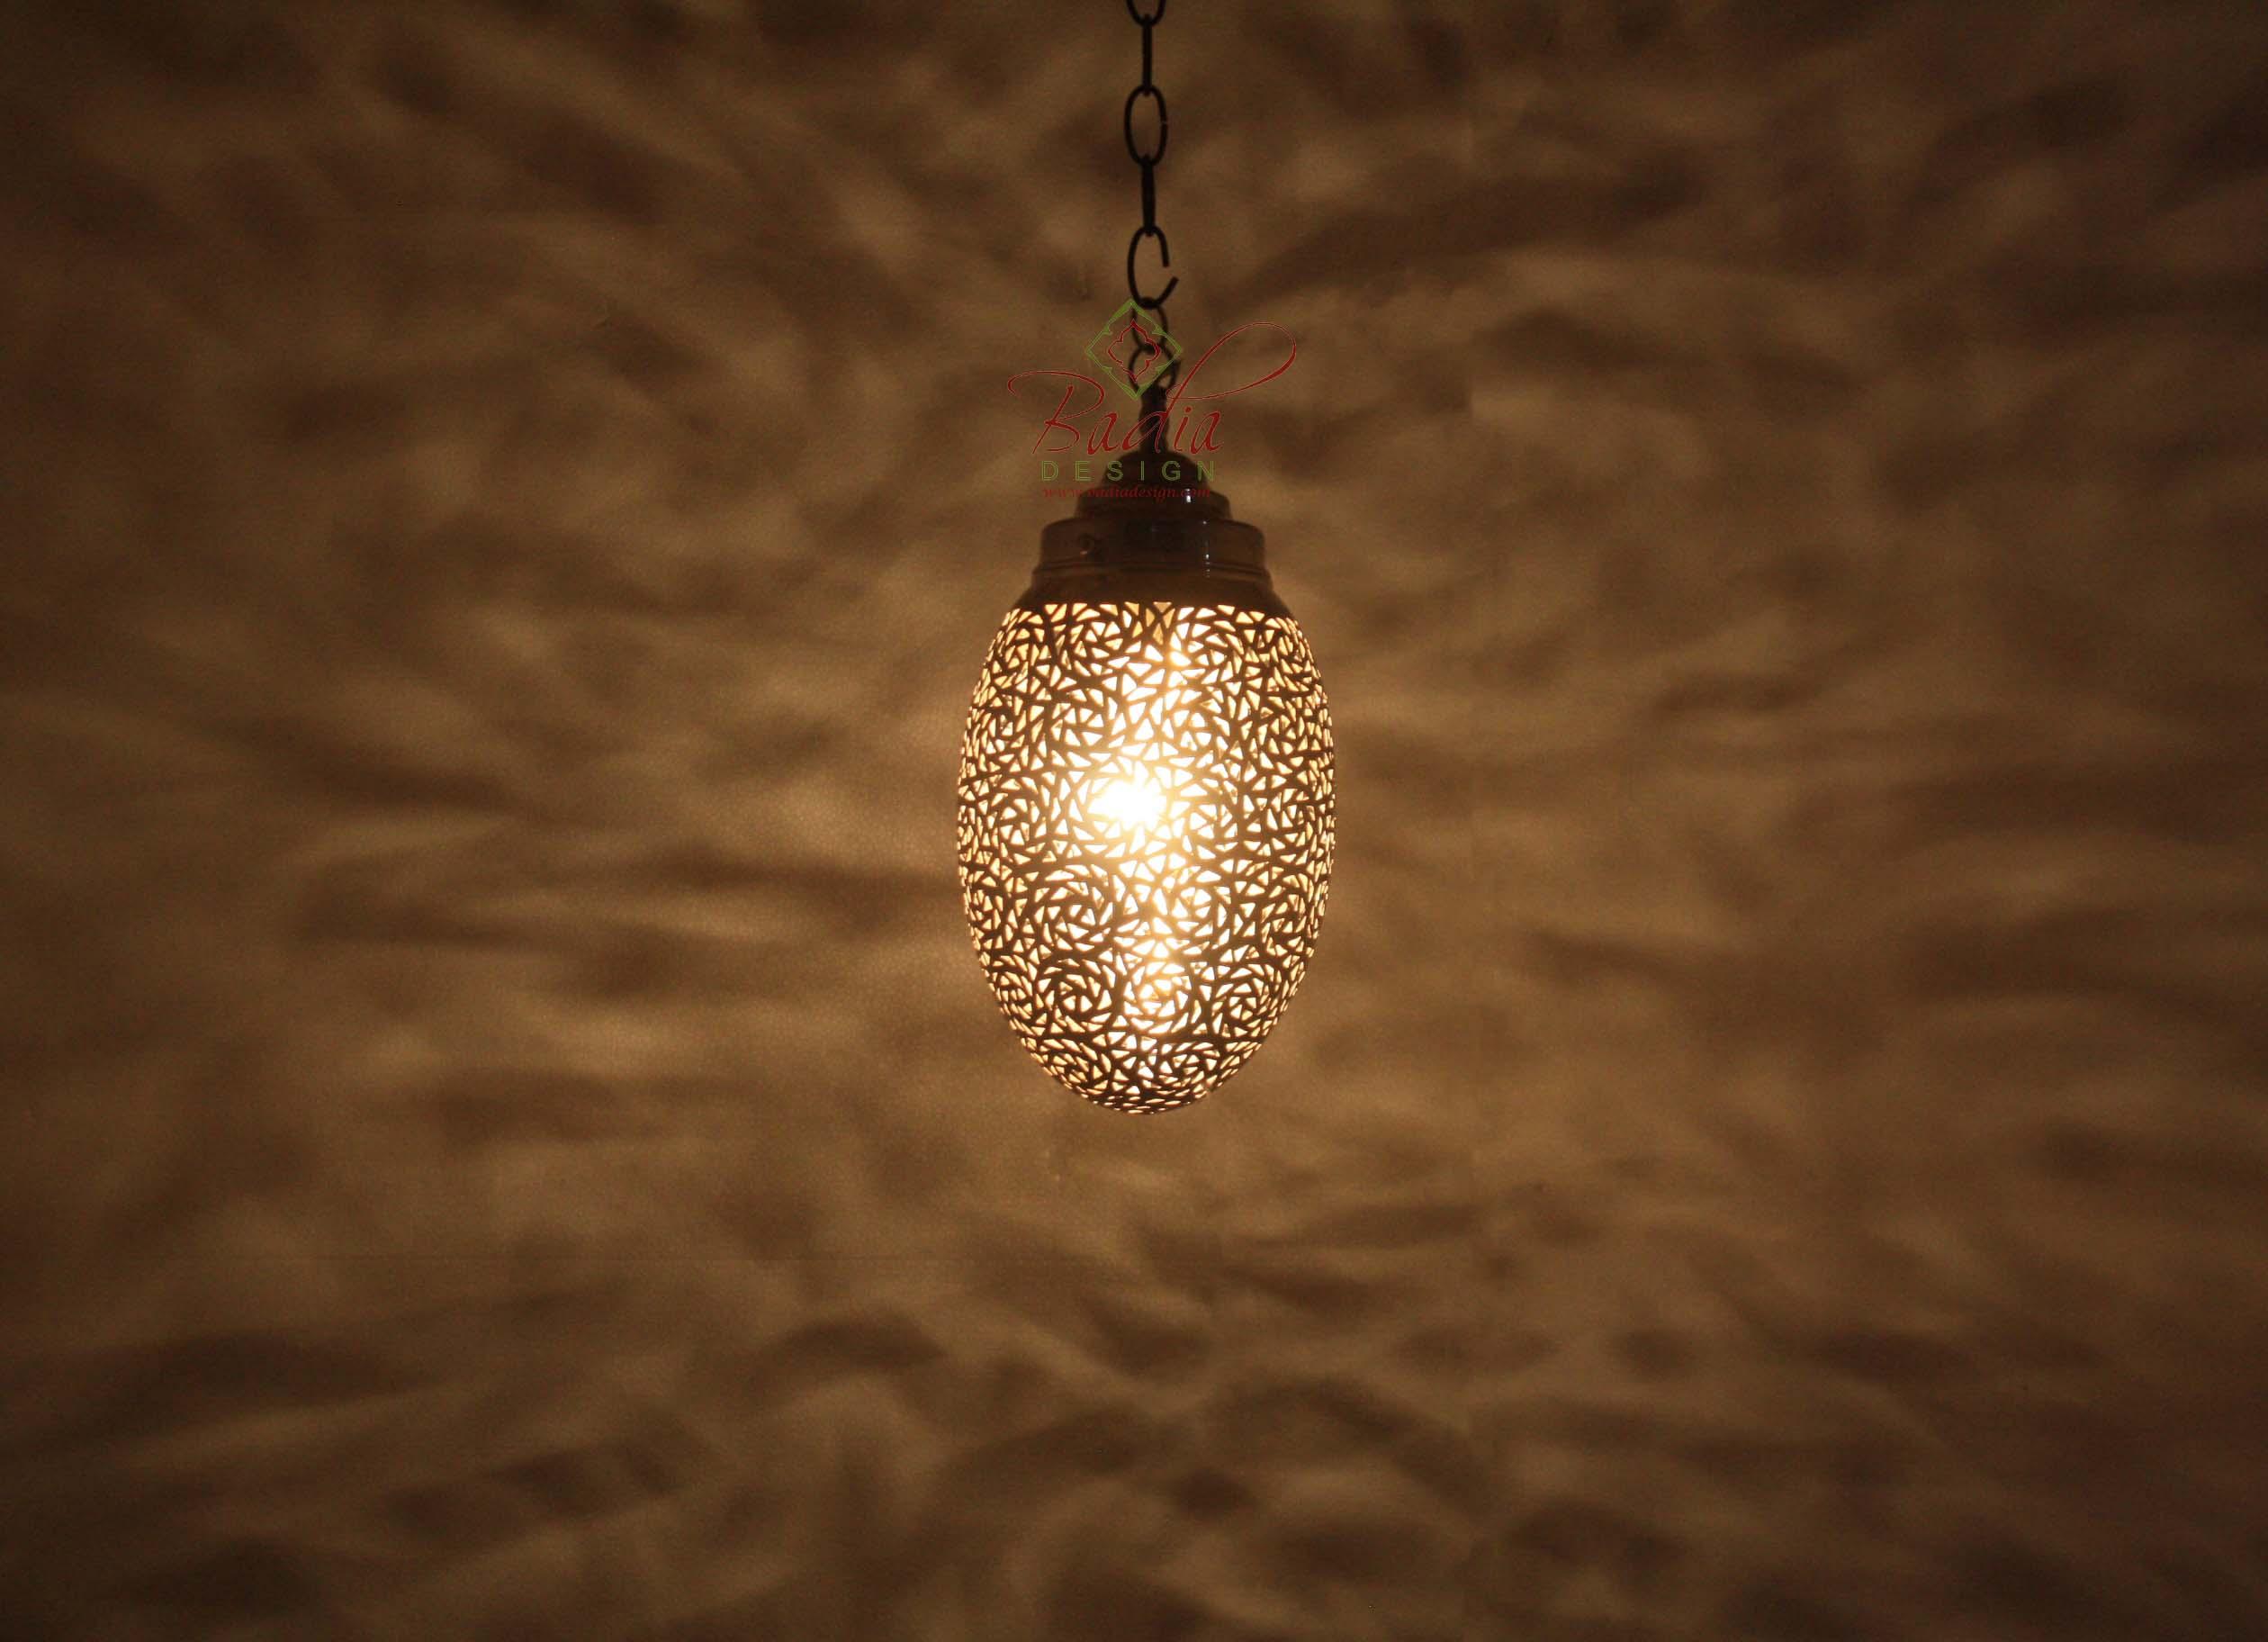 moroccan-silver-teardrop-shaped-pendant-light-lig352-3.jpg